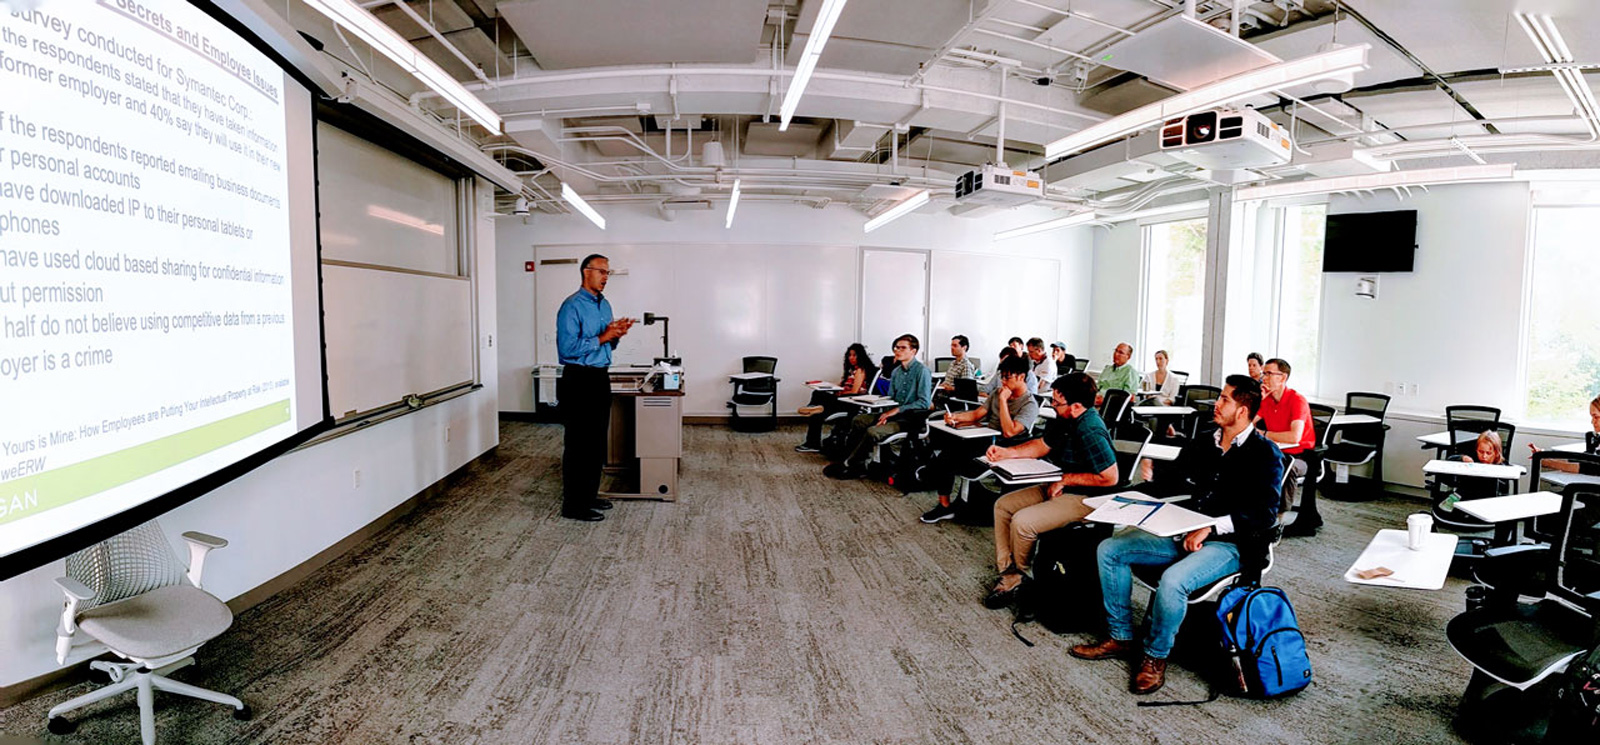 Brad Treat teaches a class